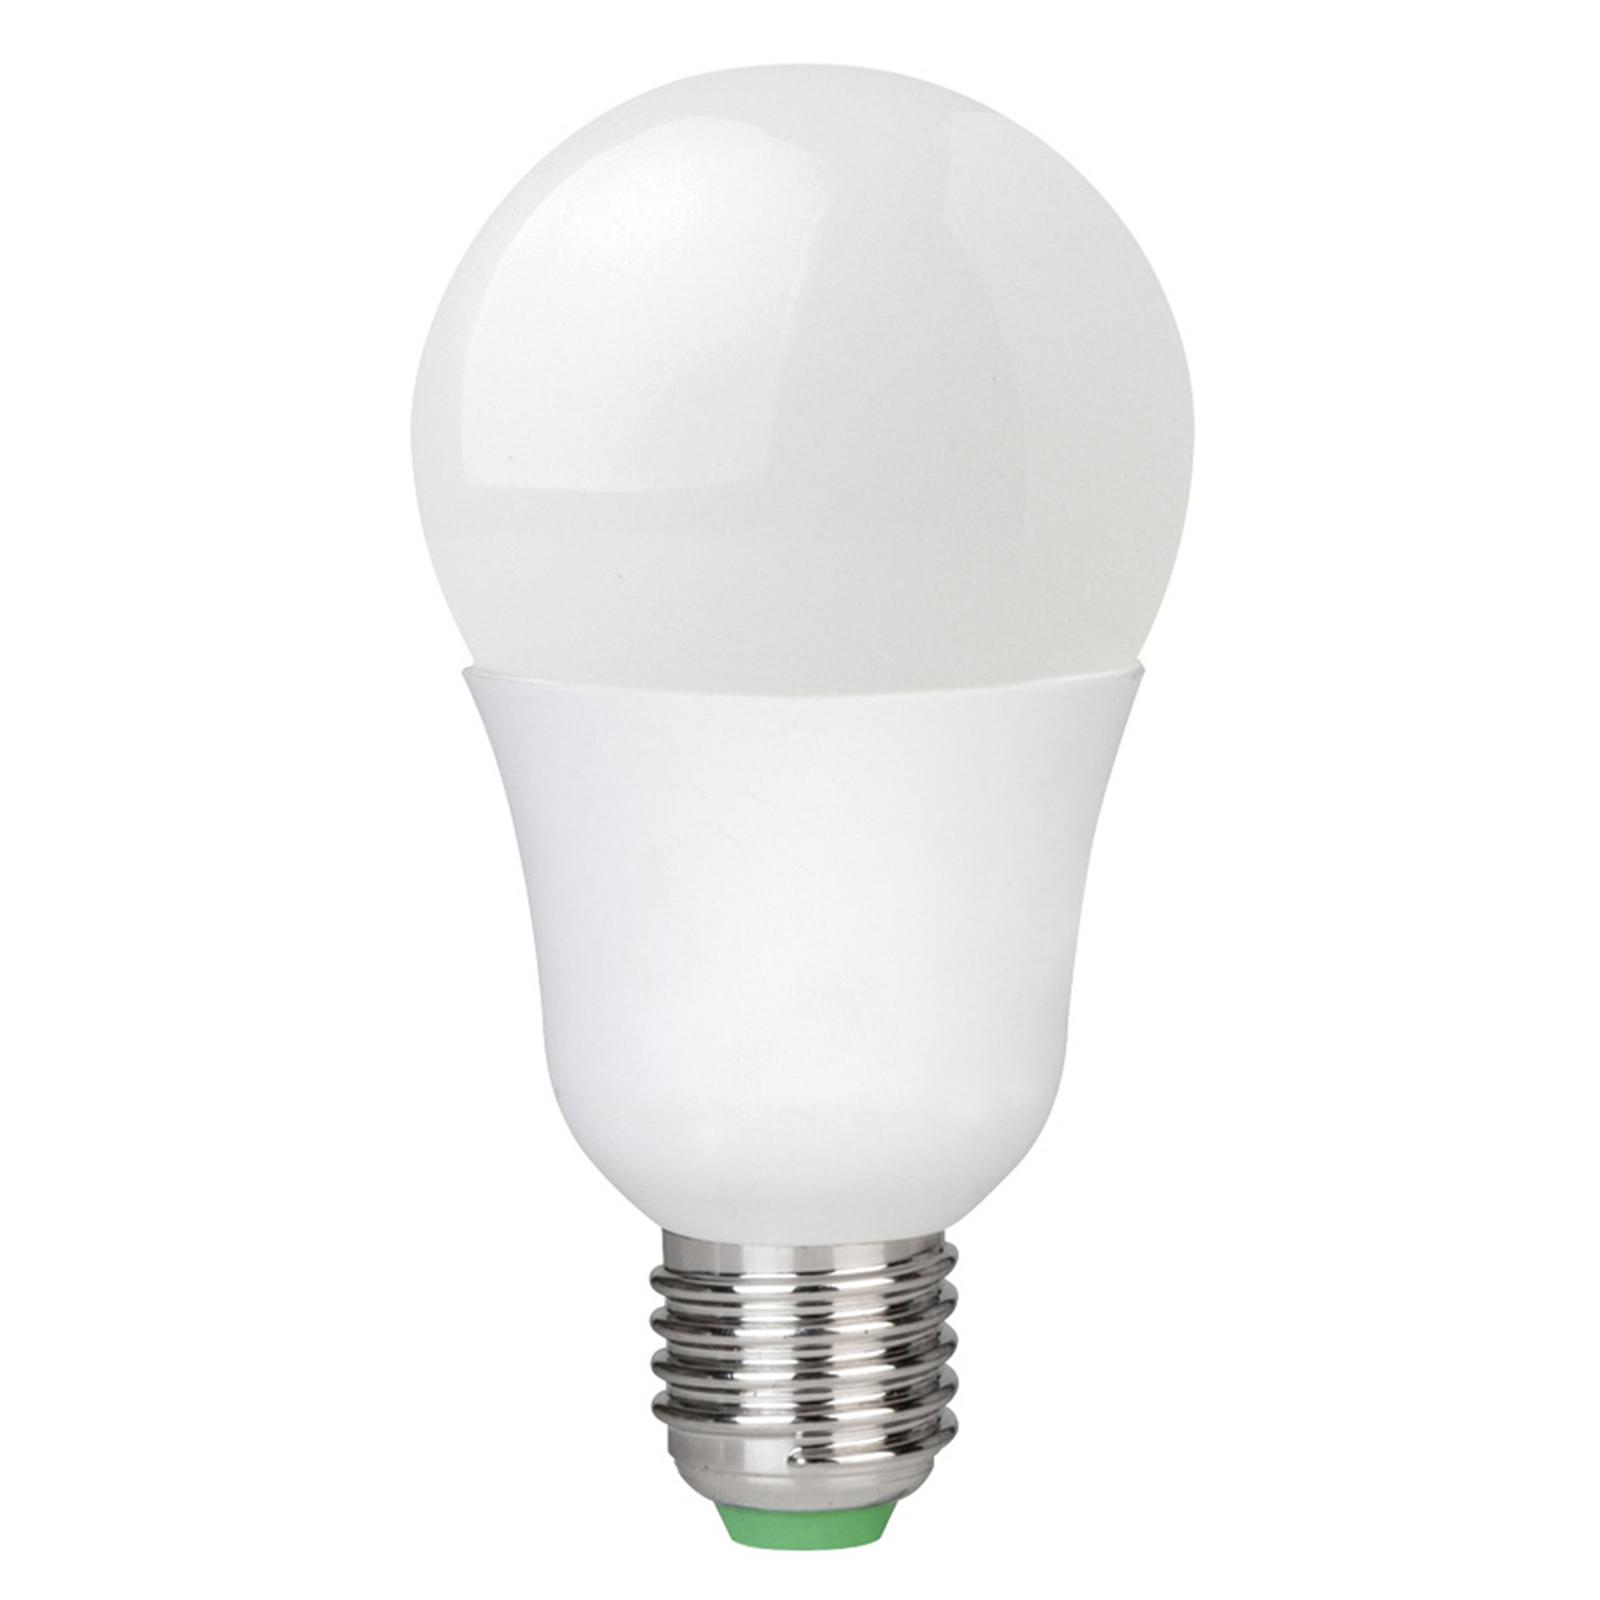 E27 11W 828 LED gloeilamp MEGAMAN Smart Lighting